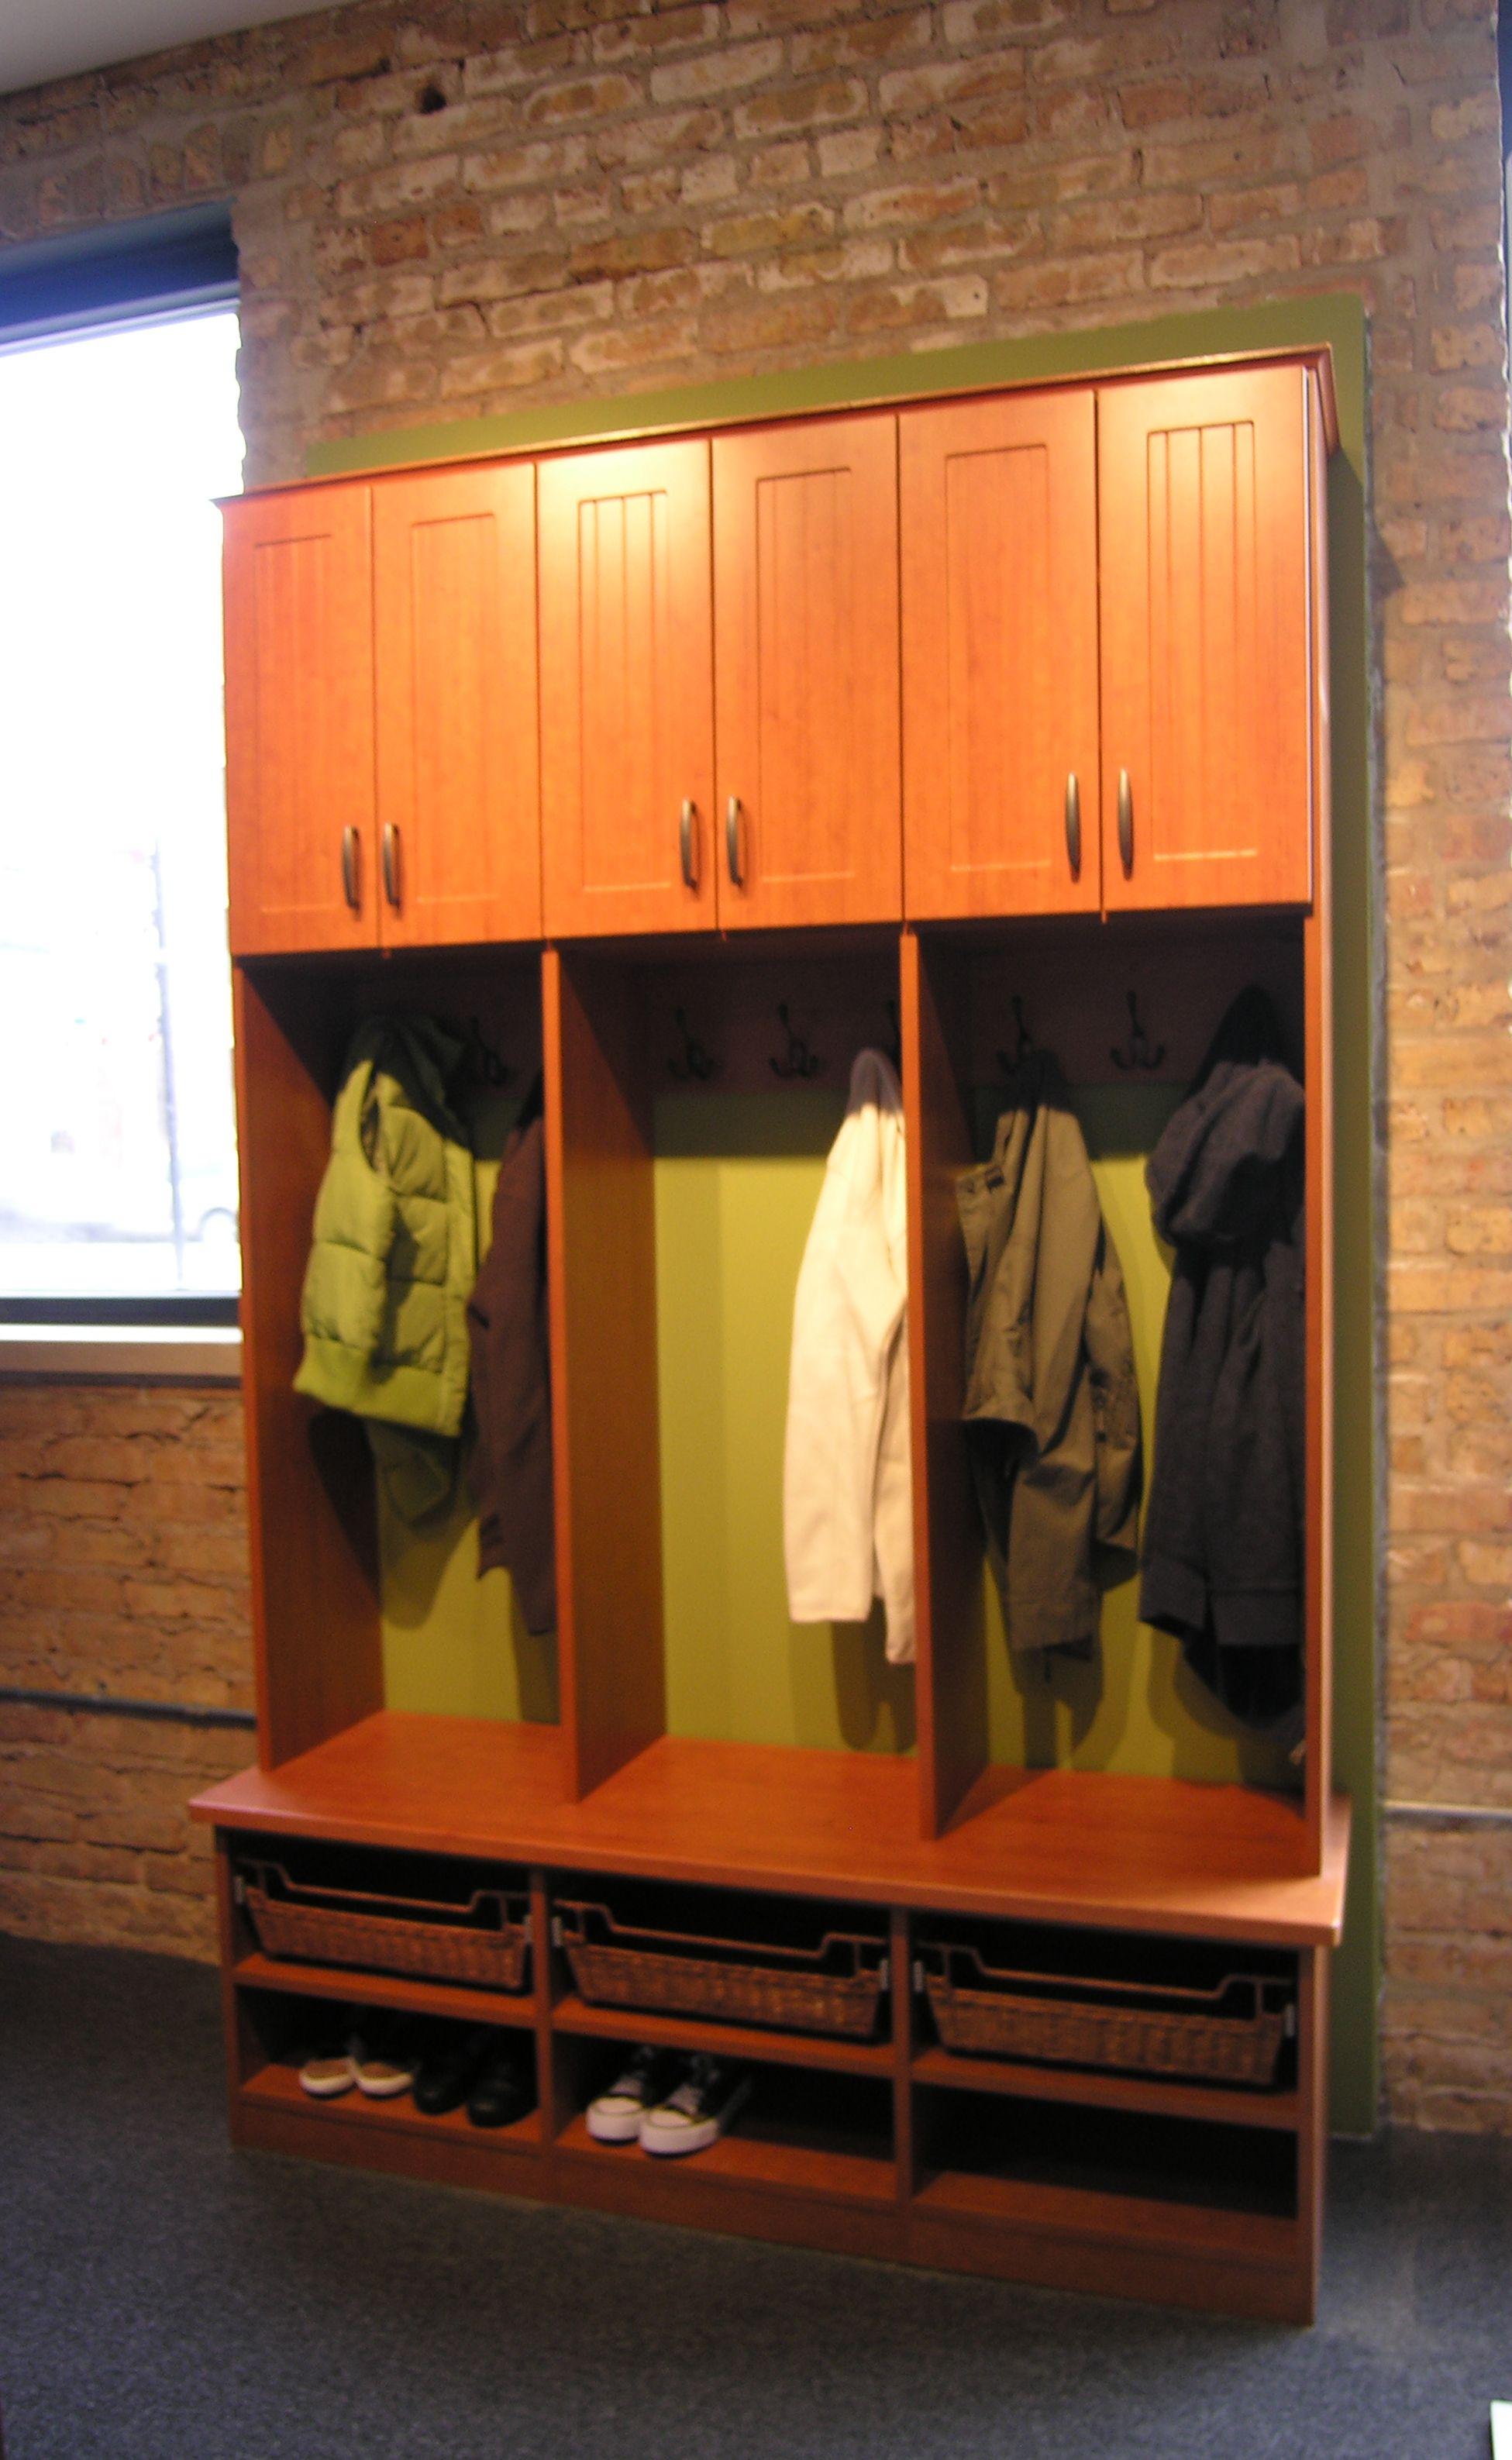 Beau Rustic Cherry Mud Room Perfection Custom Closets (Chicago, Illinois)  Aperfectcloset.com